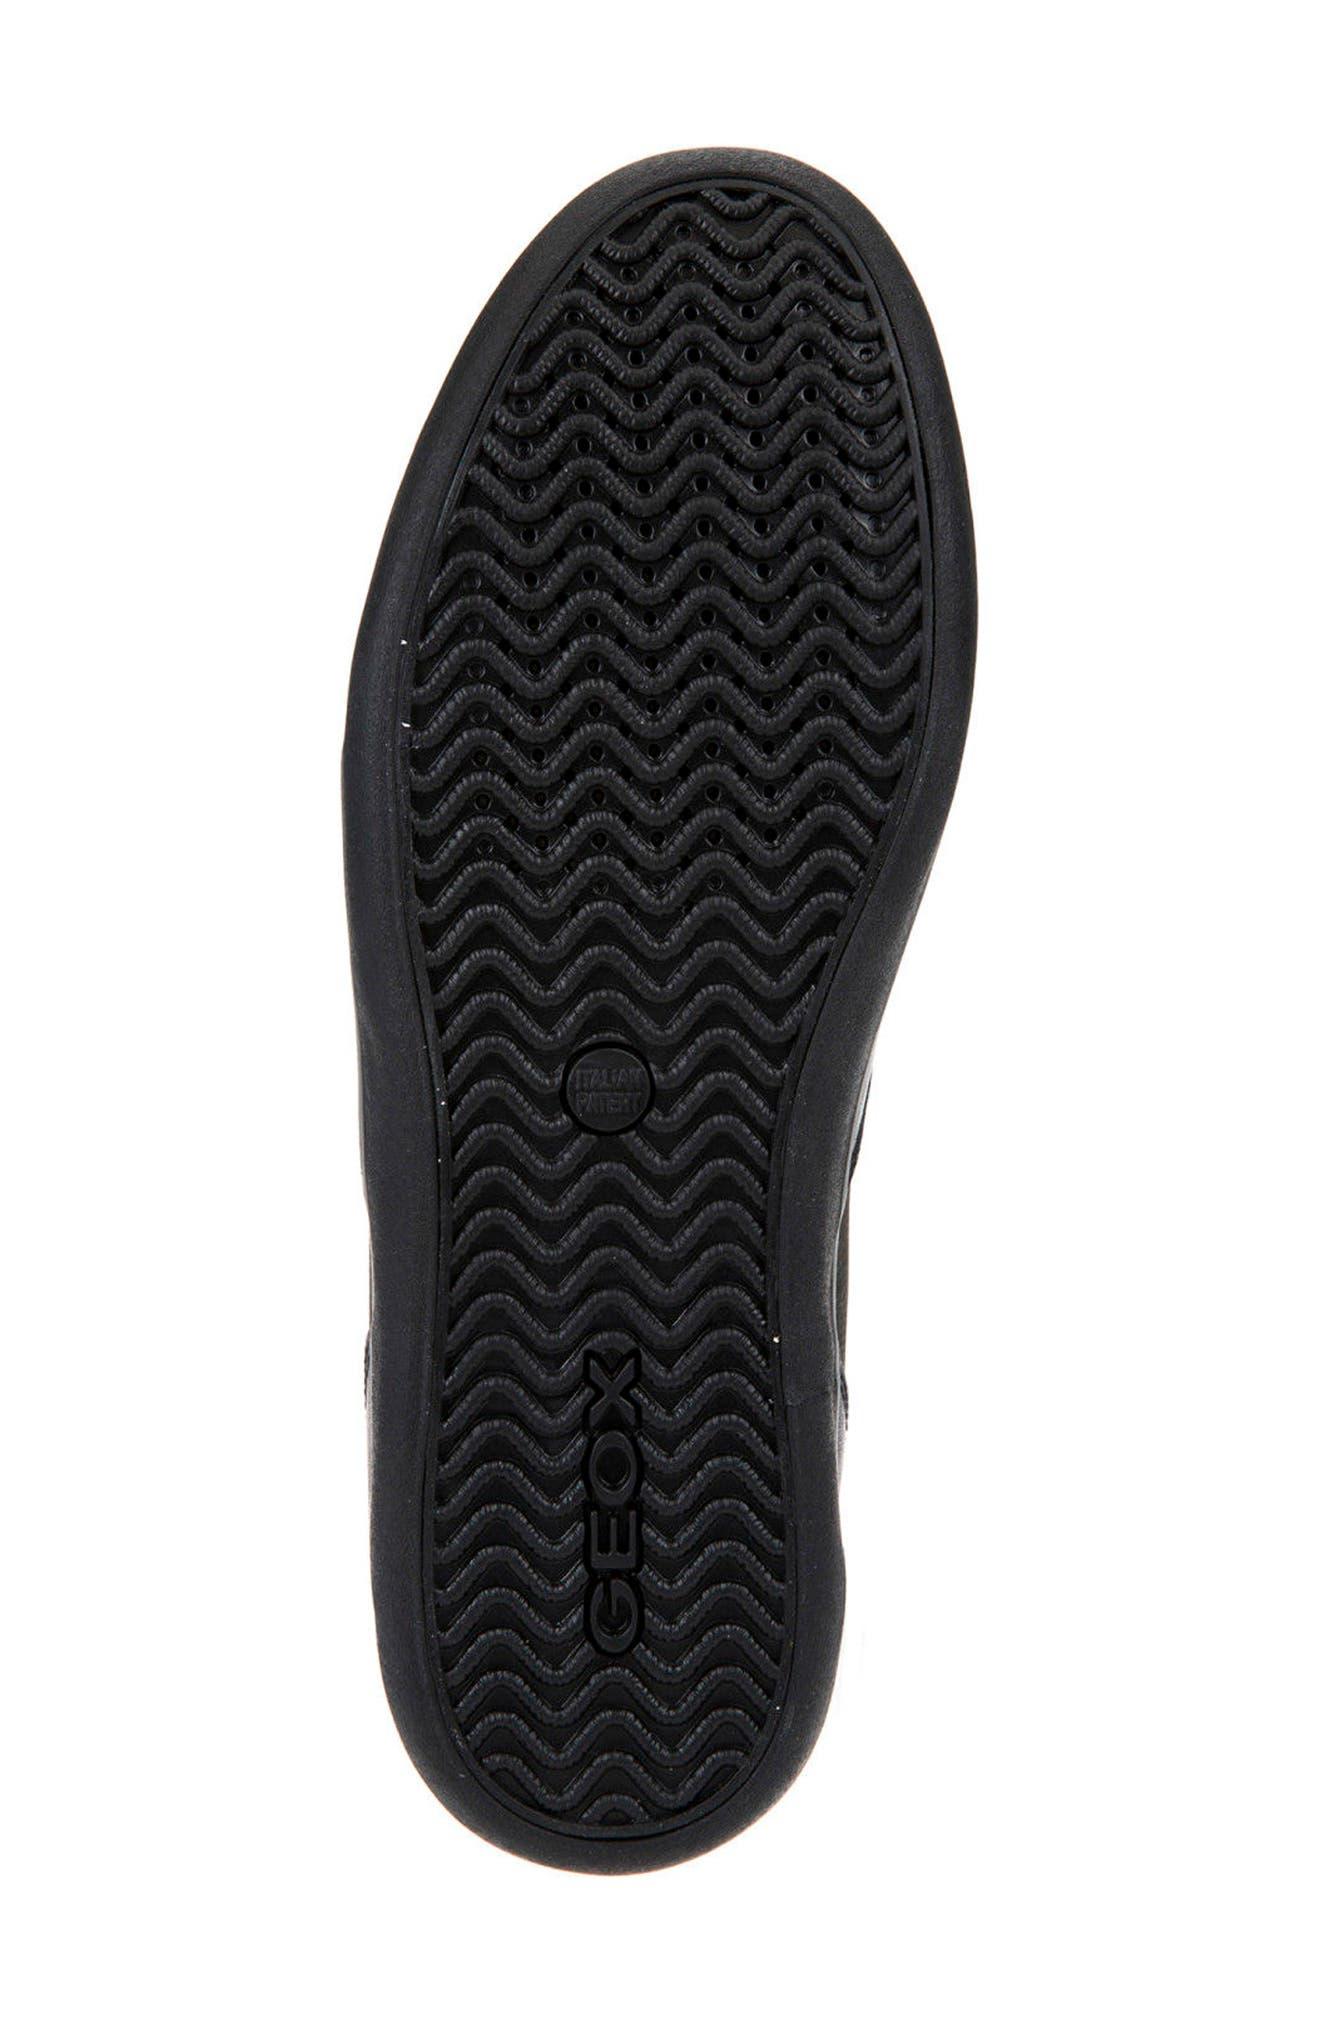 Box 31 High Top Sneaker,                             Alternate thumbnail 6, color,                             Black